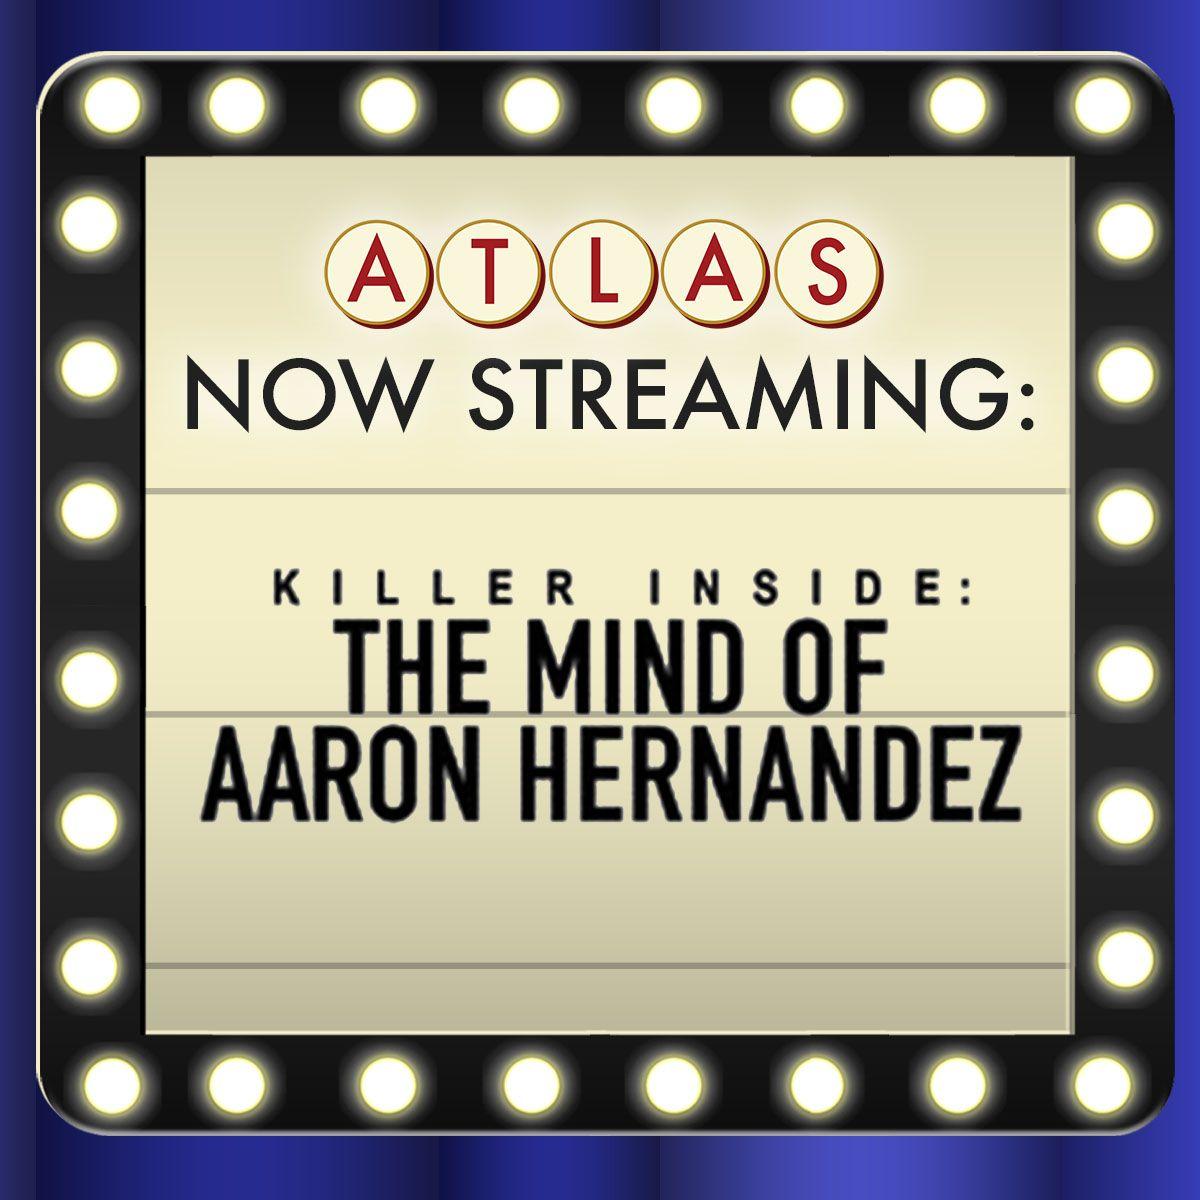 Killer Inside: The Mind of Aaron Hernandez - Atlas Now Streaming 57